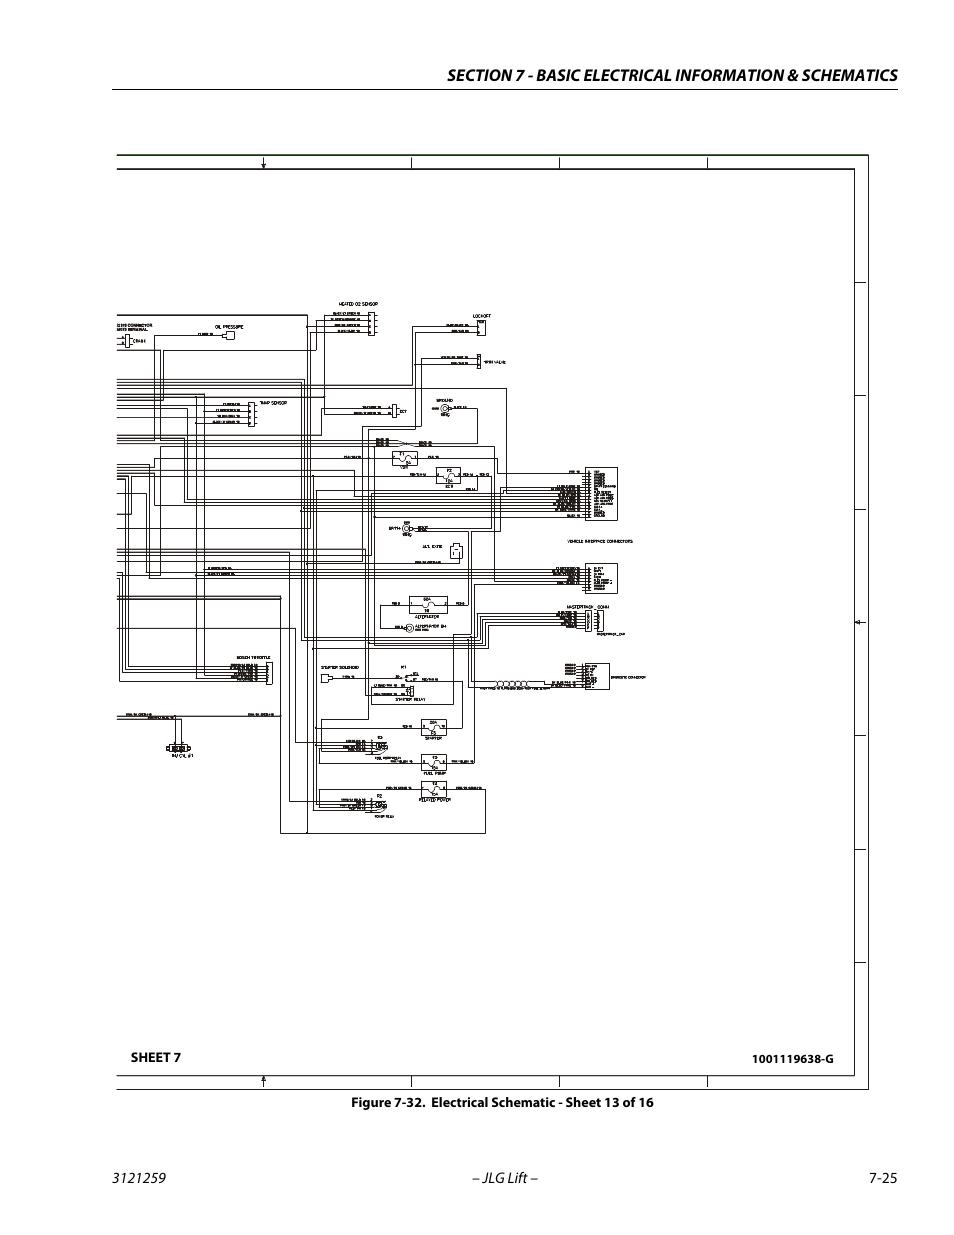 jlg 1932e2 wiring diagram electric wetjet wiring diagram  jlg 35 electric service manual wiring diagrams wiring] with 28 jlg 340aj service manual page339